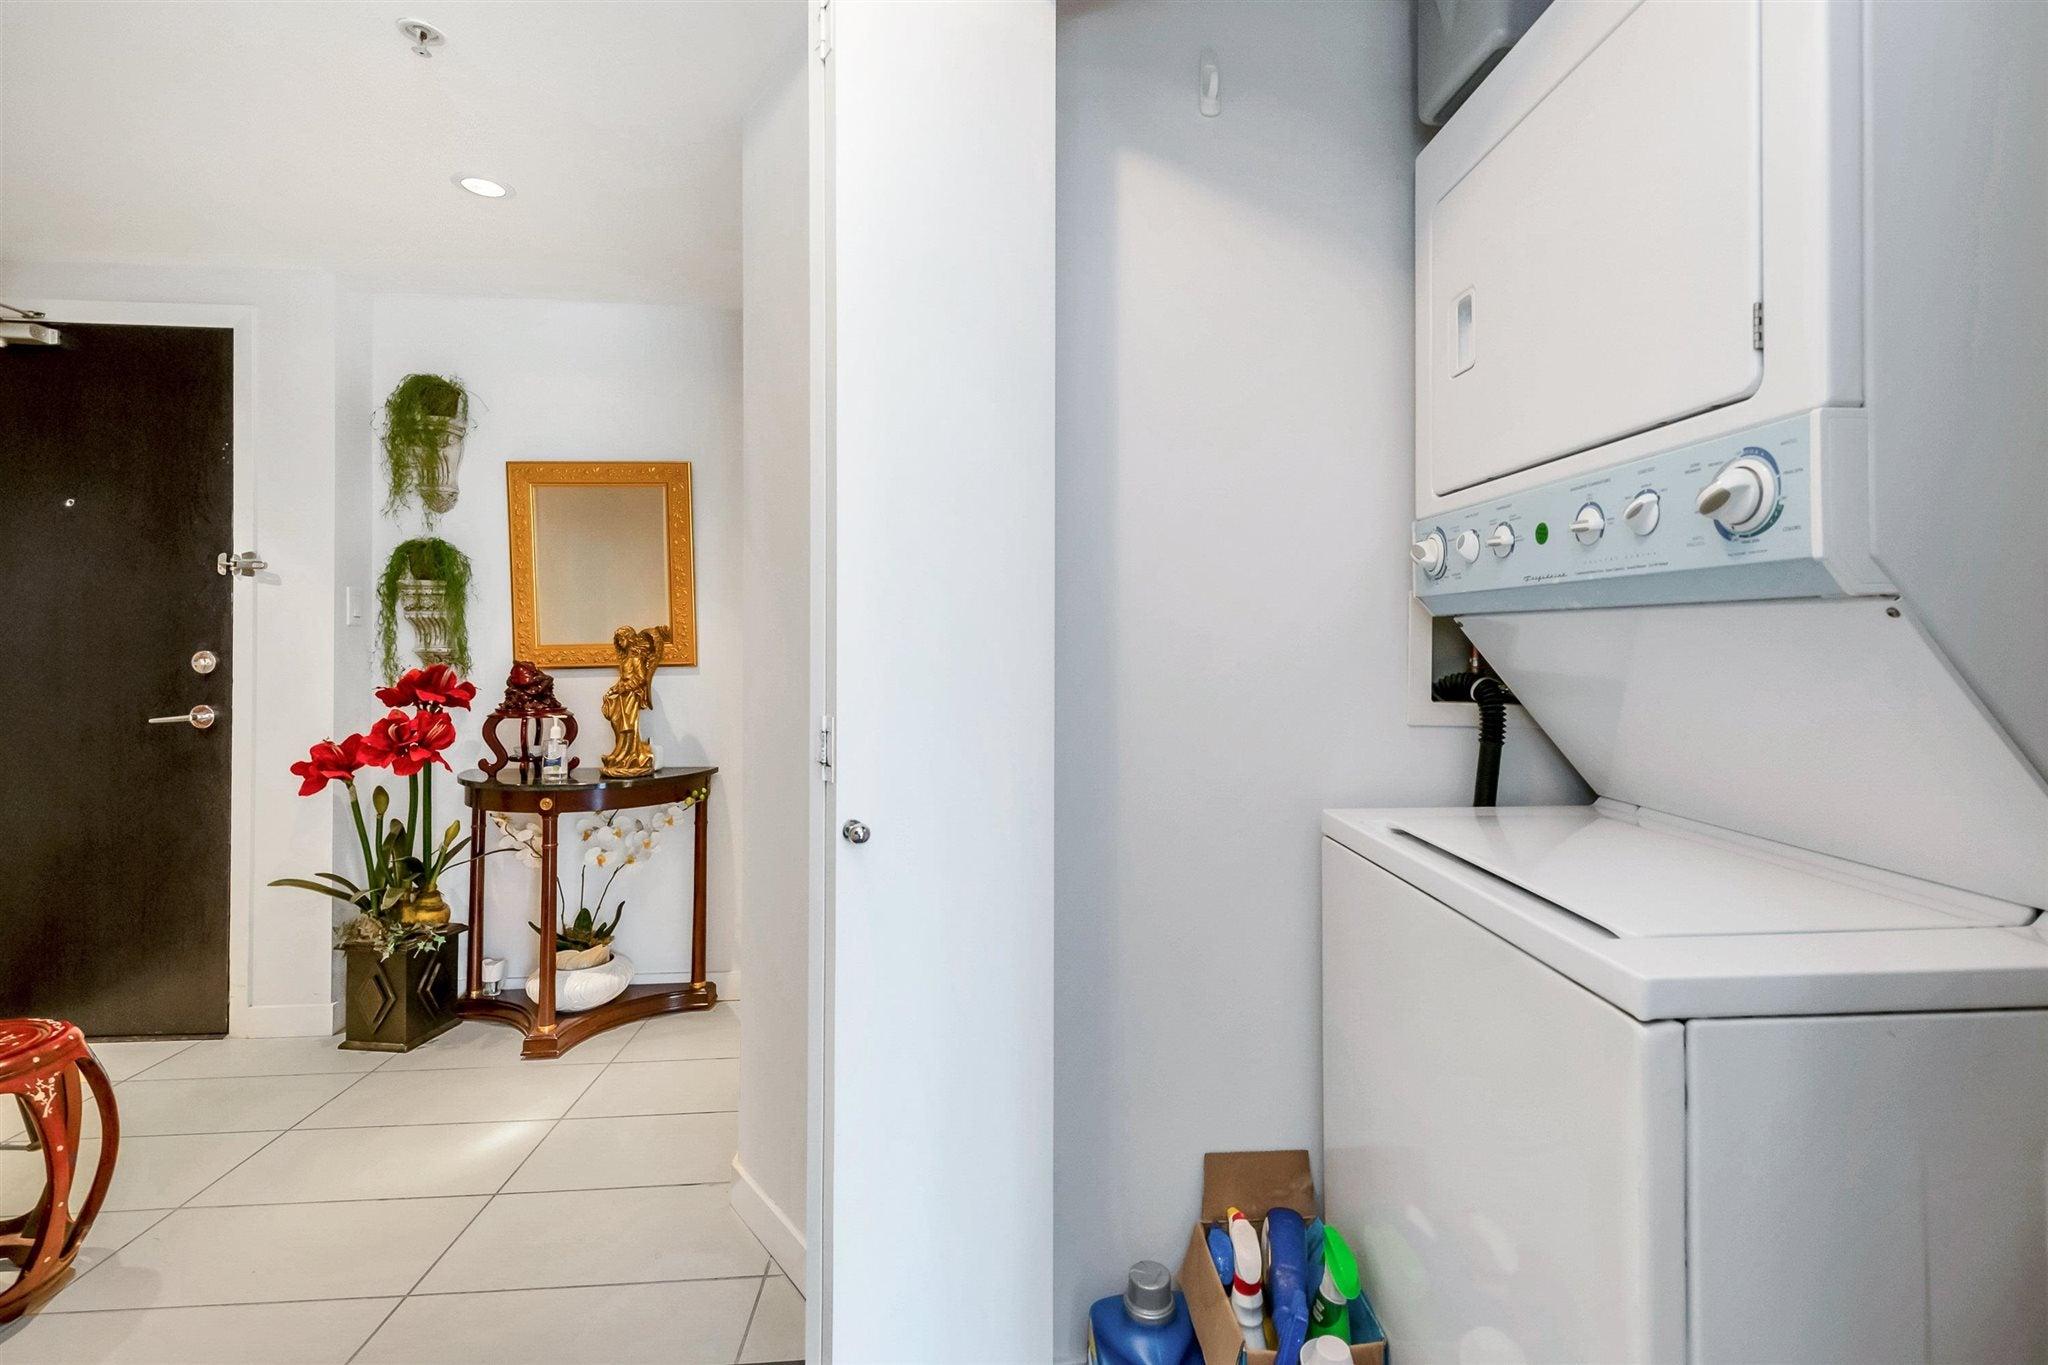 205 7225 ACORN AVENUE - Highgate Apartment/Condo for sale, 2 Bedrooms (R2606454) - #19